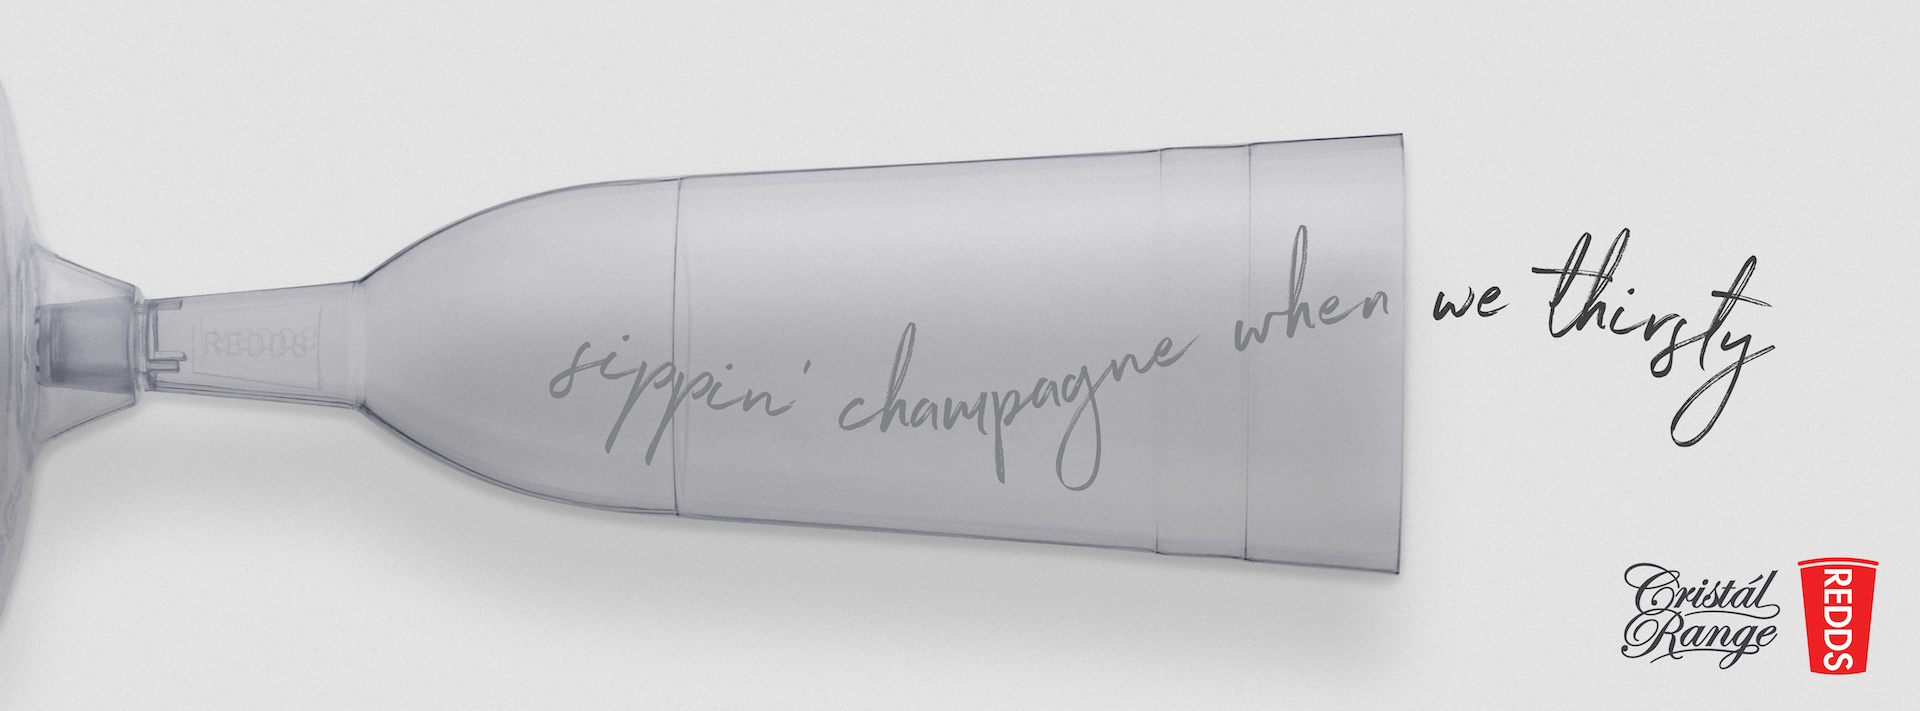 REDDS CRISTÀL RANGE PLASTIC CHAMPAGNE FLUTES 75ML